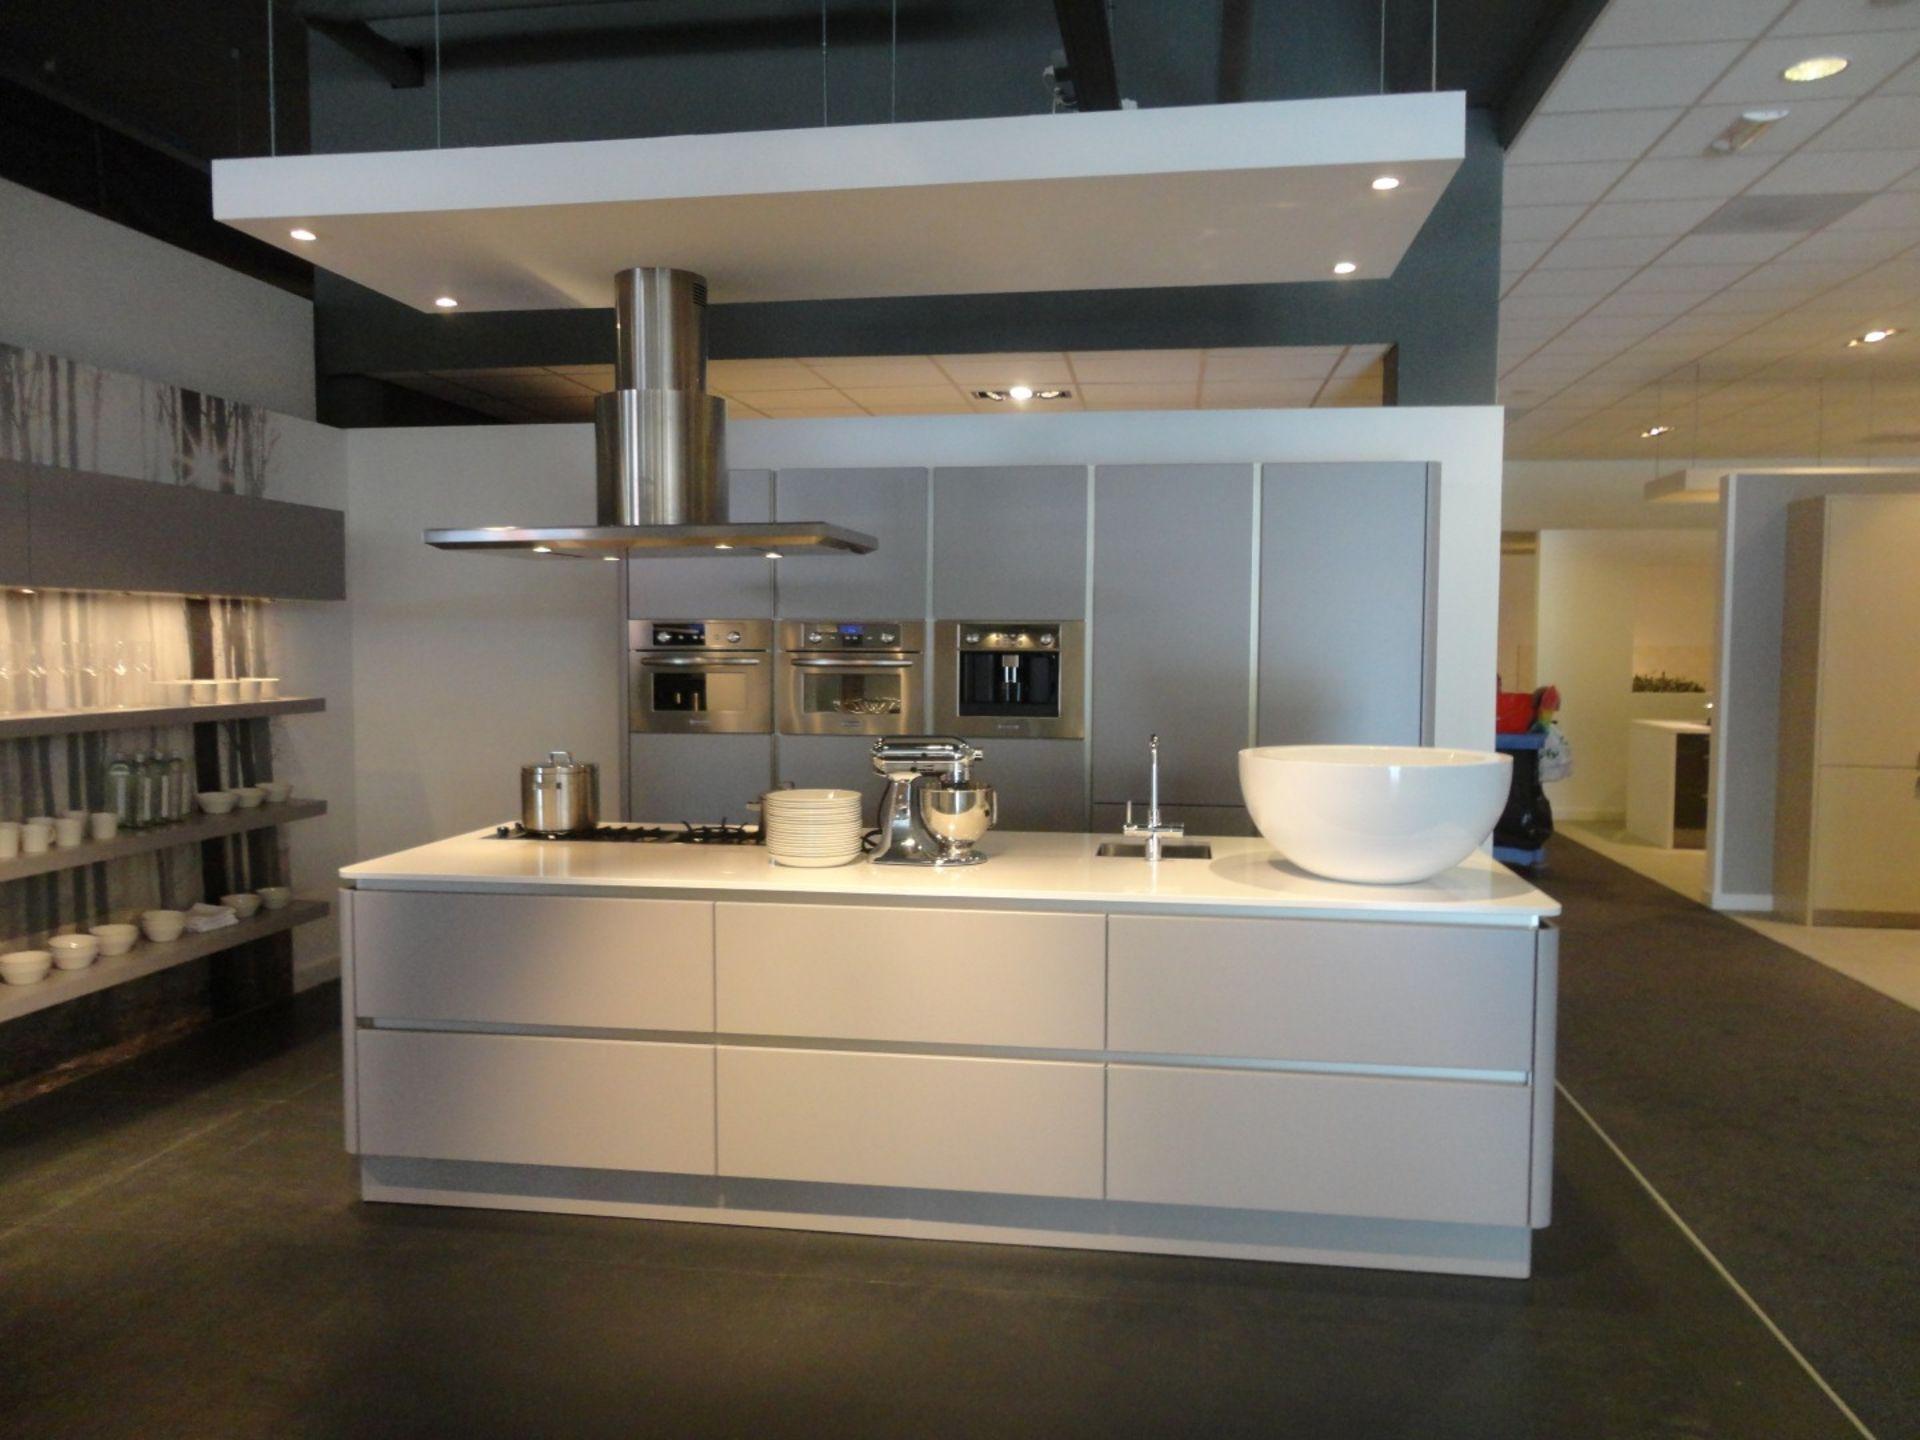 Showroomkeuken Basaltgrijs ultramat CVT keukens Breda